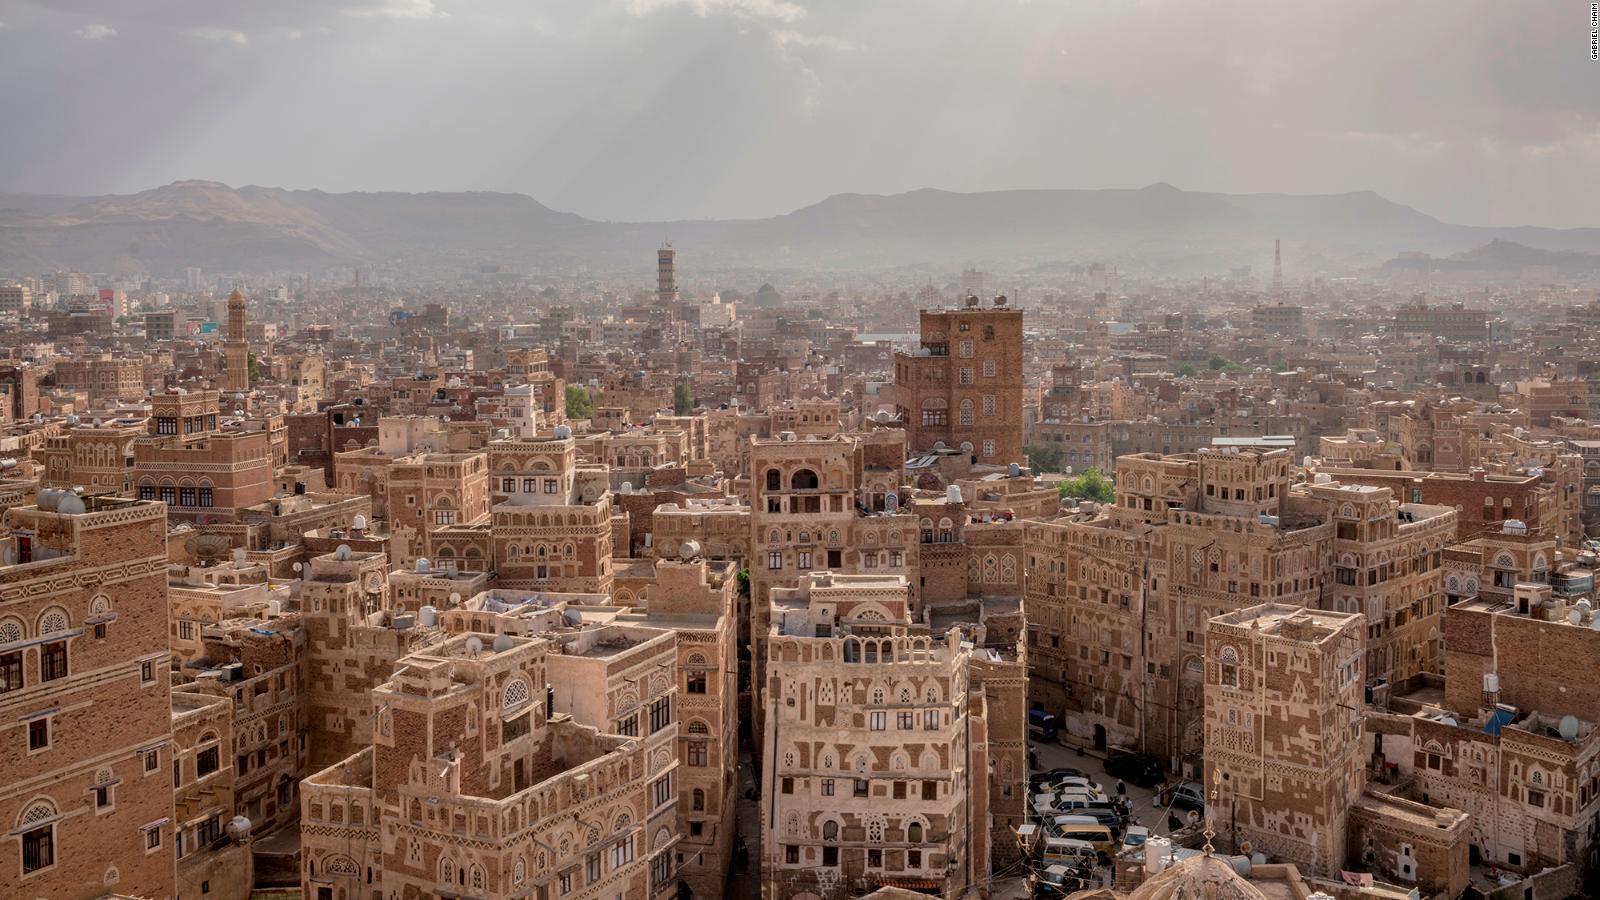 yemen rare drone footage captures life amid the rubble cnn